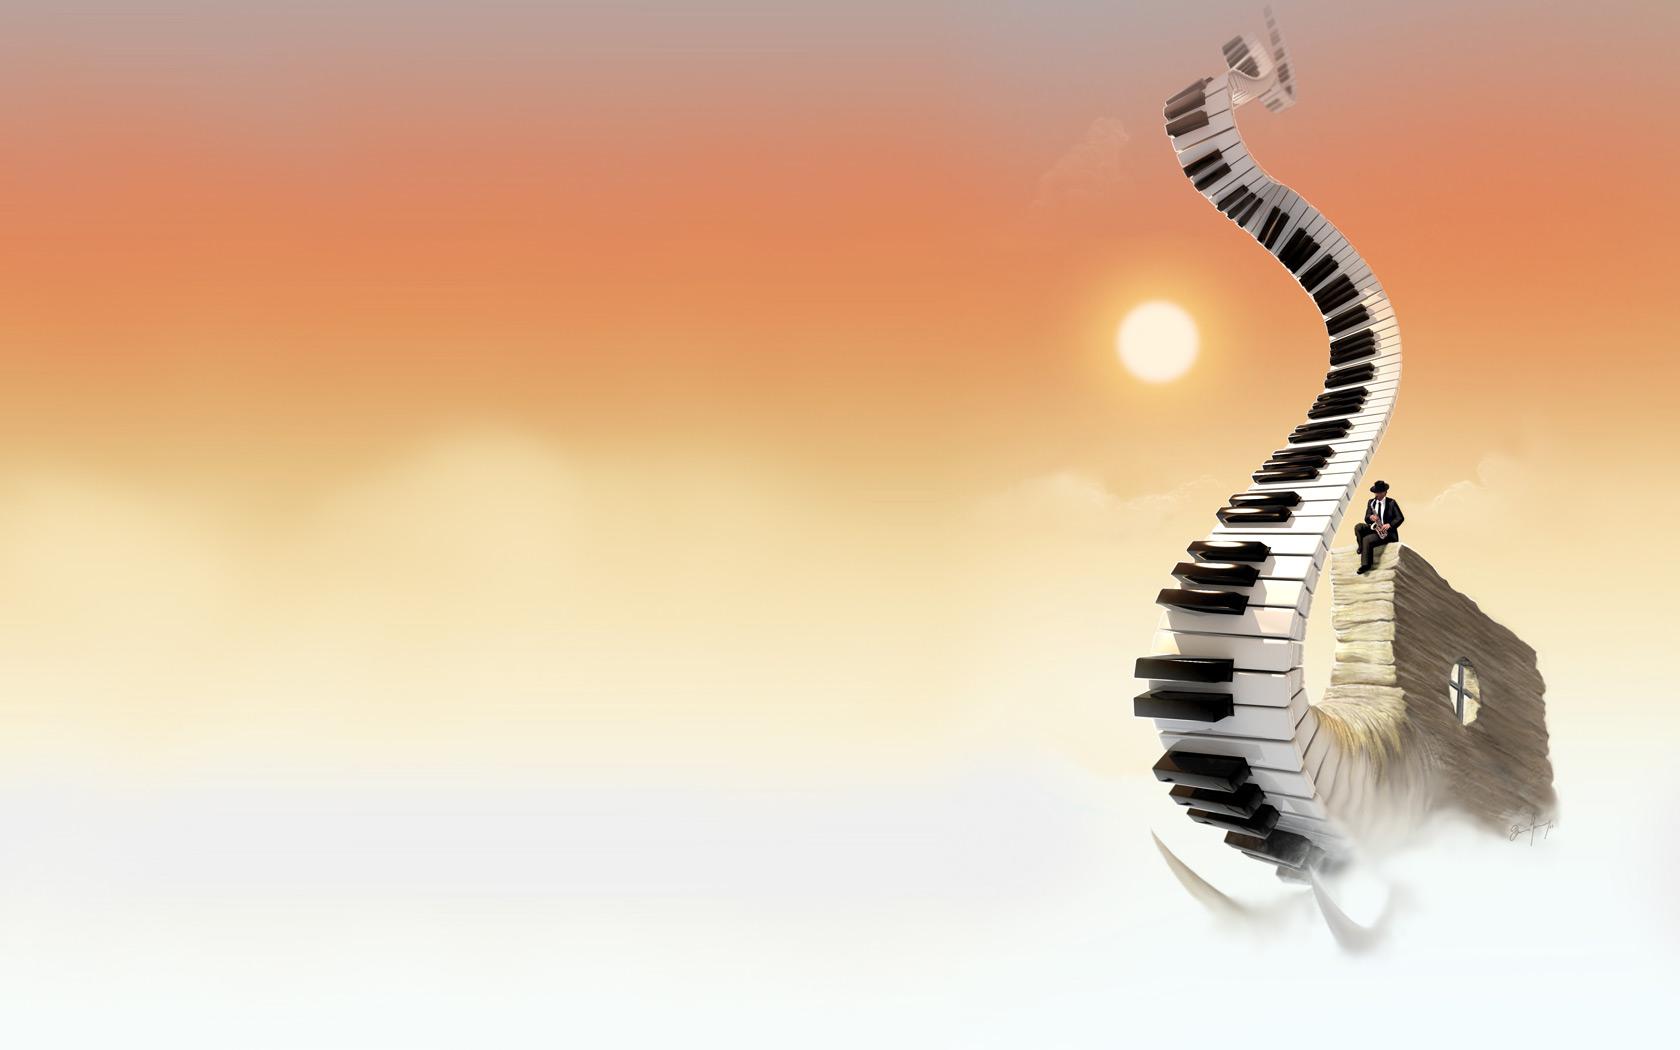 Piano In The Sky 1680x1050 Wallpaper Teahub Io